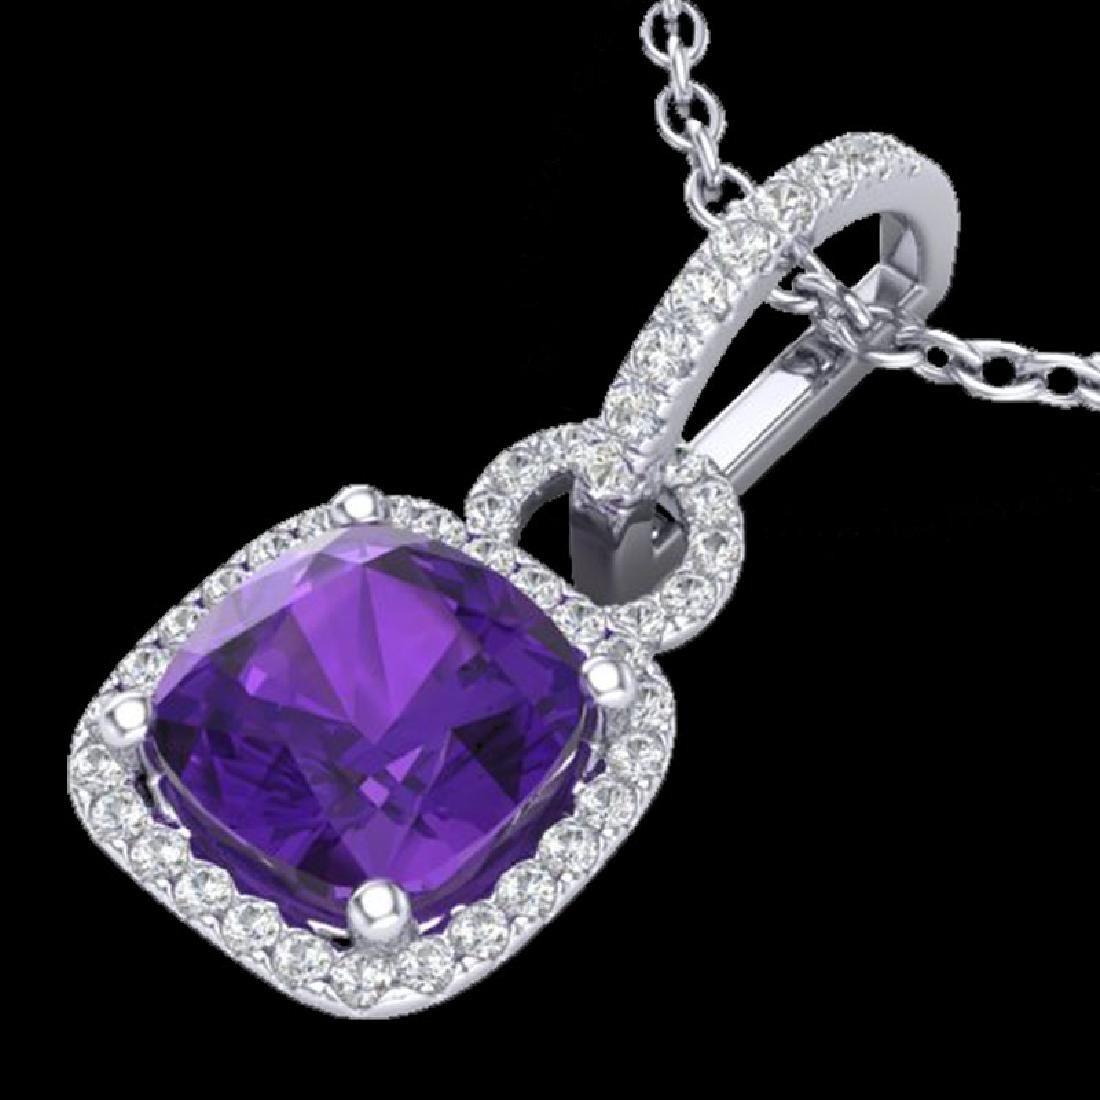 3.50 CTW Amethyst & Micro VS/SI Diamond Necklace 18K